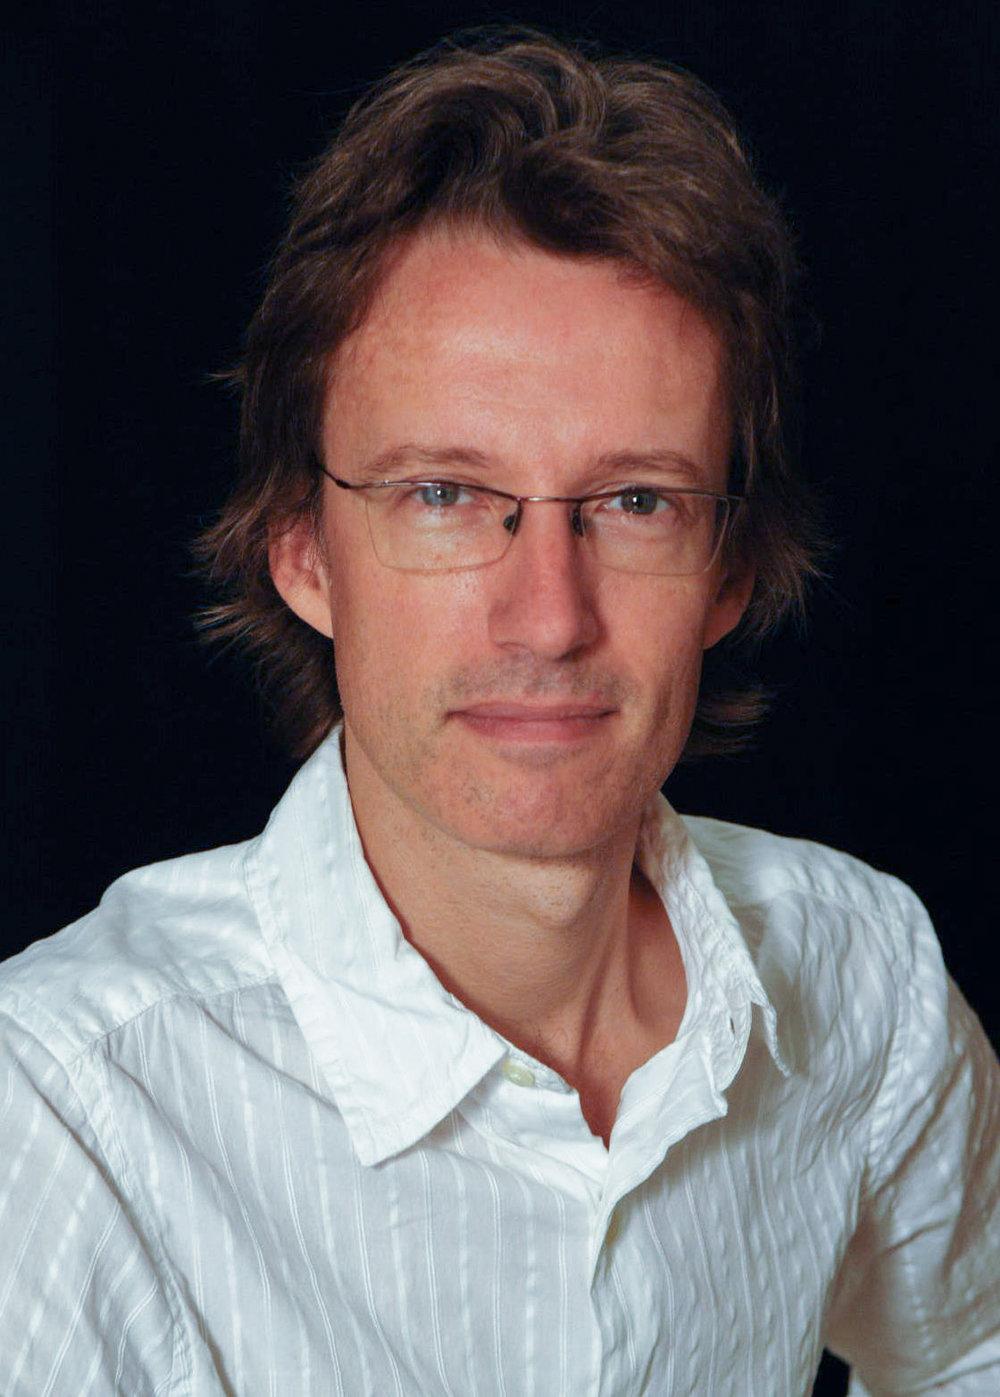 Dr. Michael Joviala , Dalcroze Eurhythmics/Improvisation